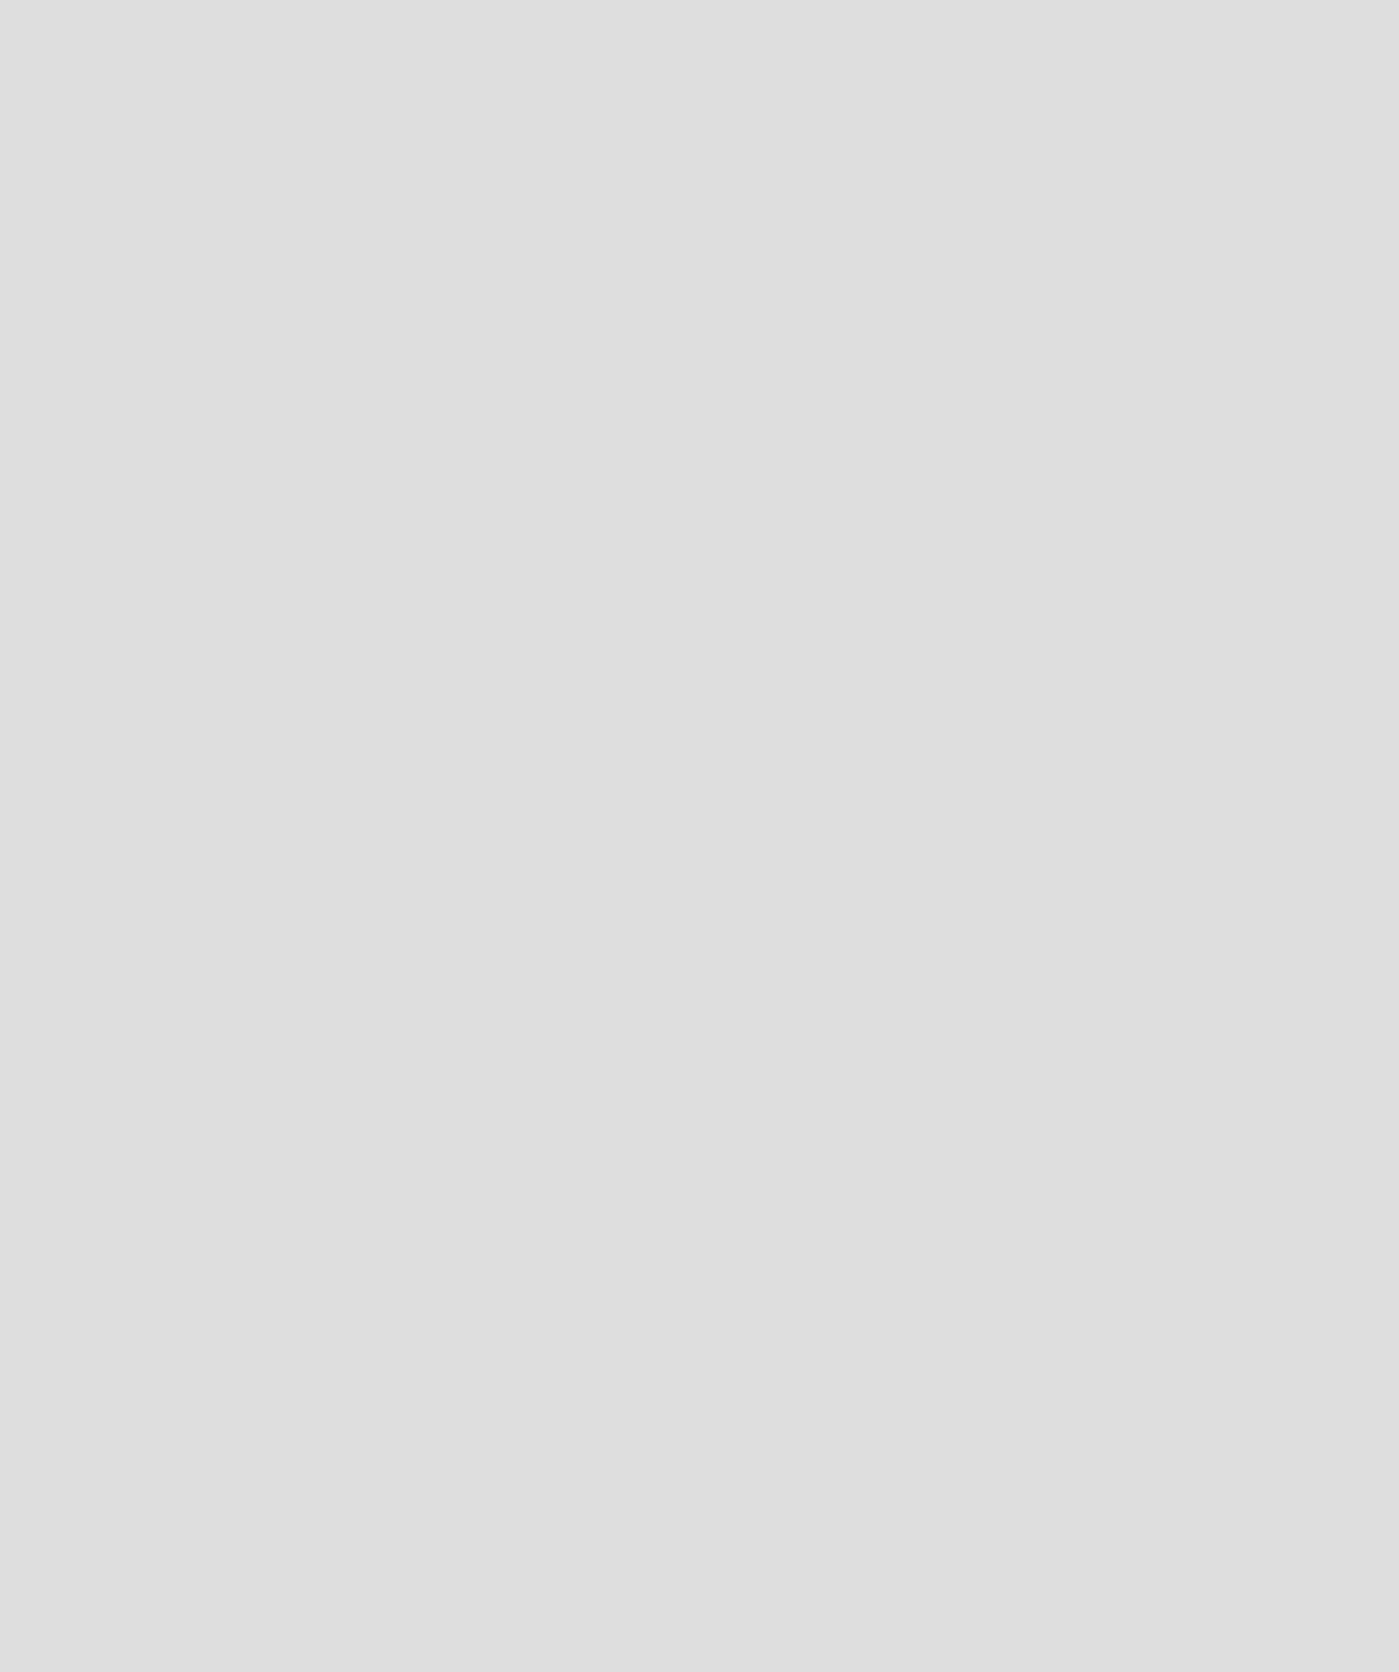 Gray Triangle